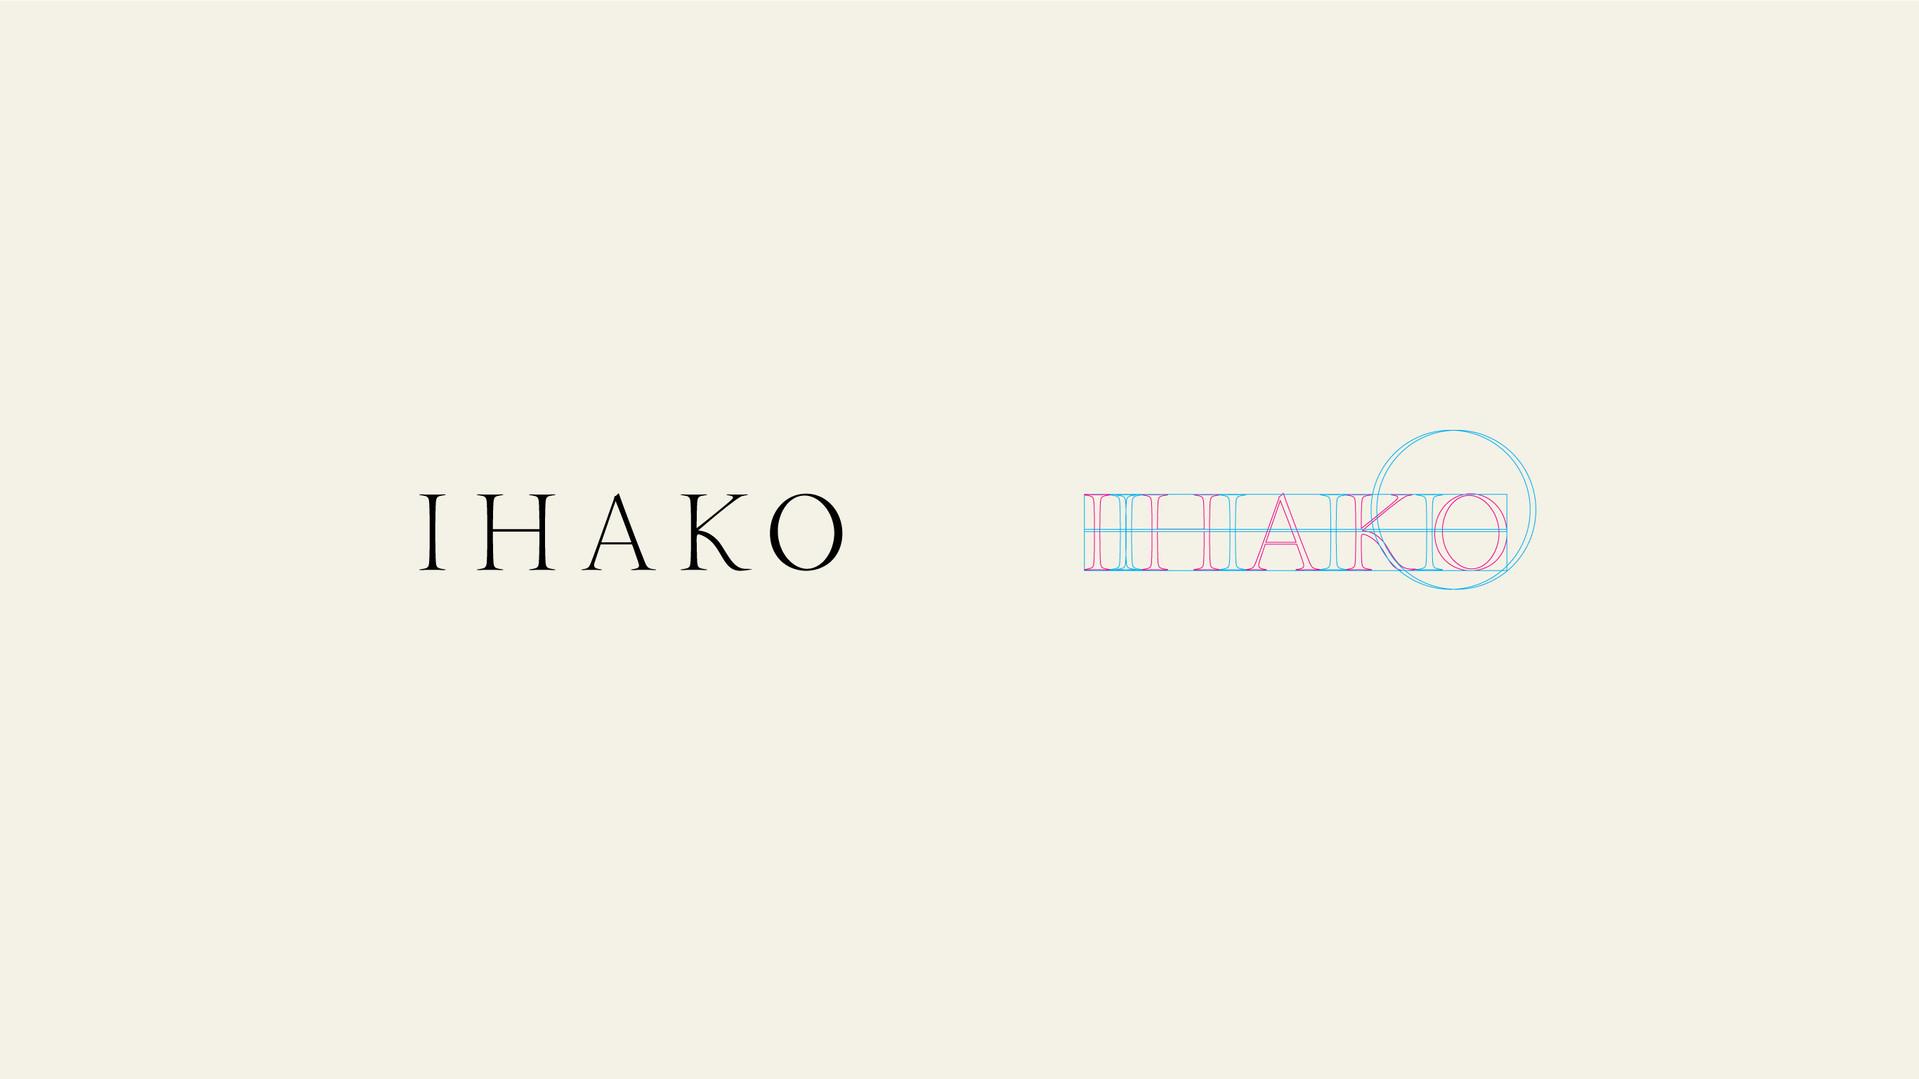 theihako.com